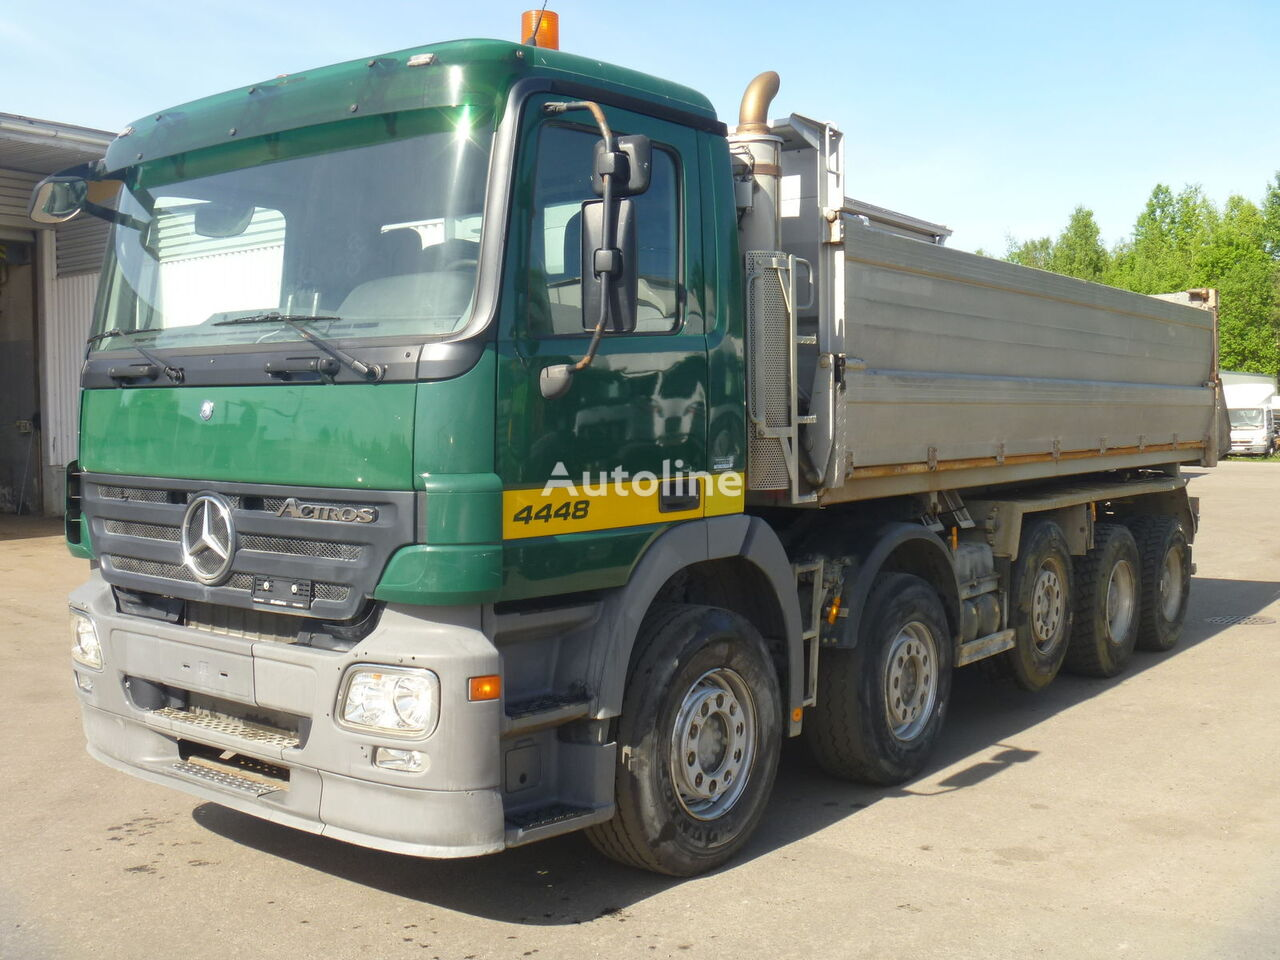 MERCEDES-BENZ Actros 4448 dump truck